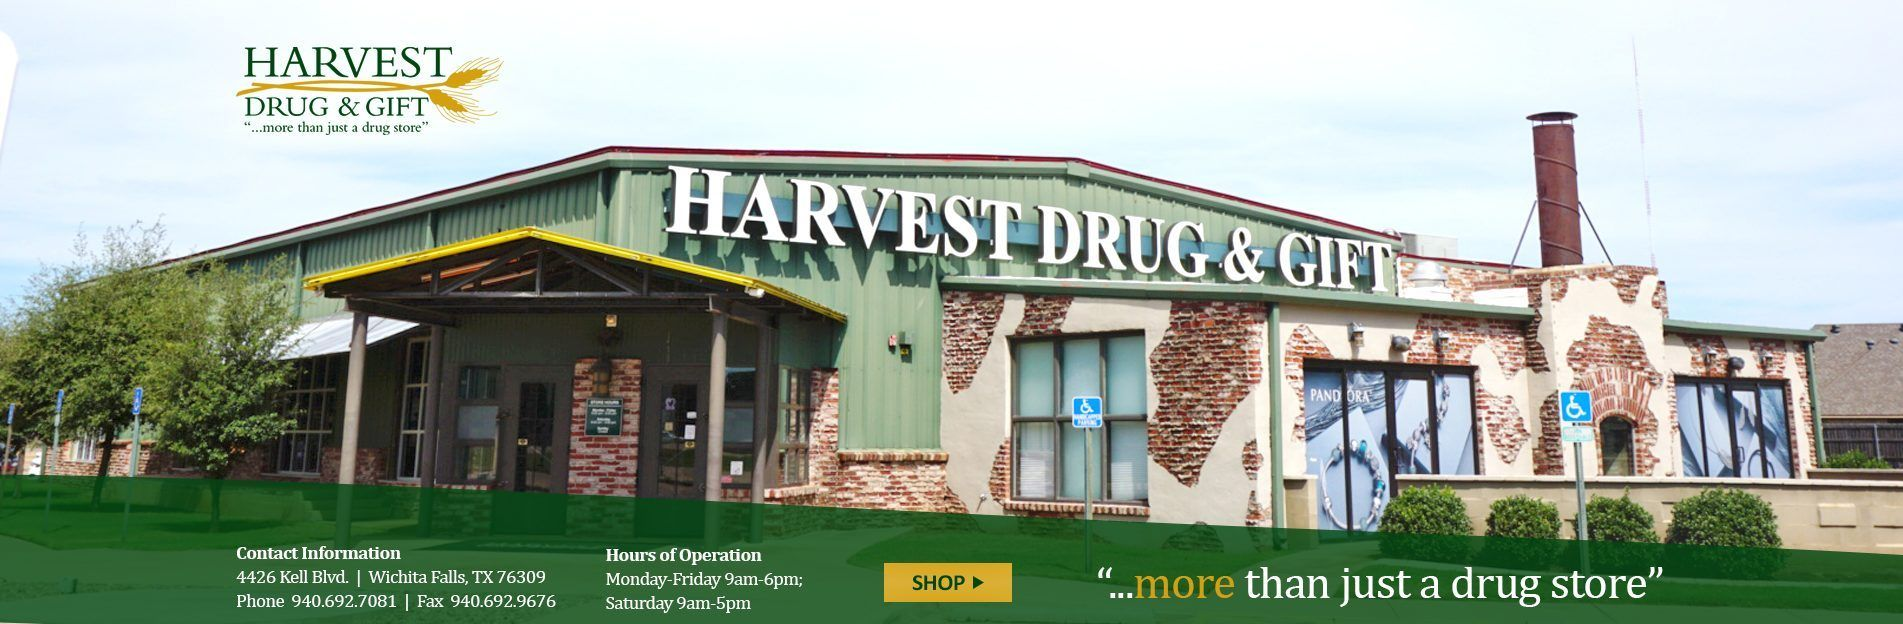 Storefront-2-1903x624.jpg